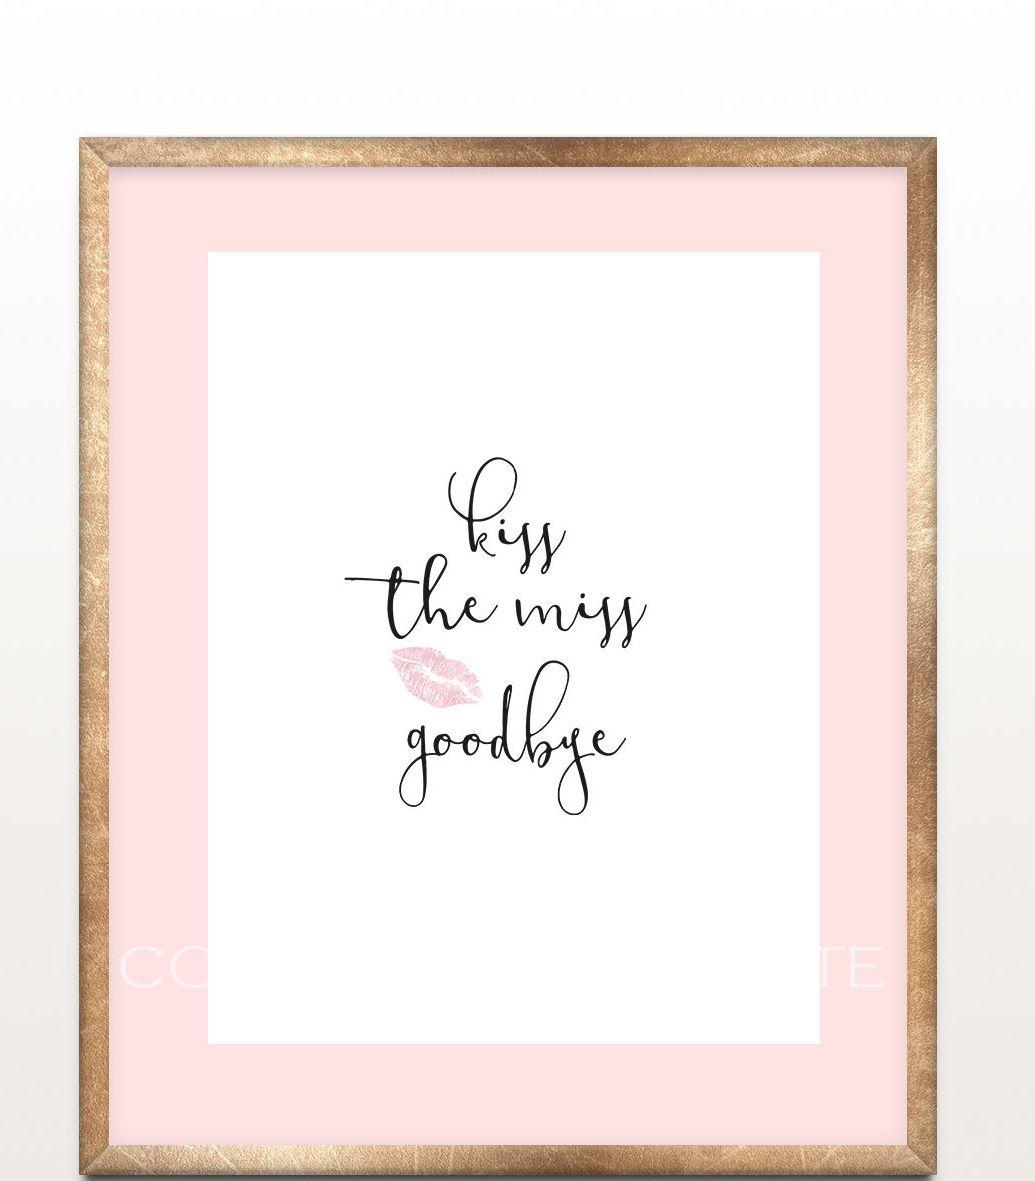 graphic relating to Kiss the Miss Goodbye Printable named Kiss the Overlook Goodbye Indicator, Printable Bridal, Lipstick Kiss